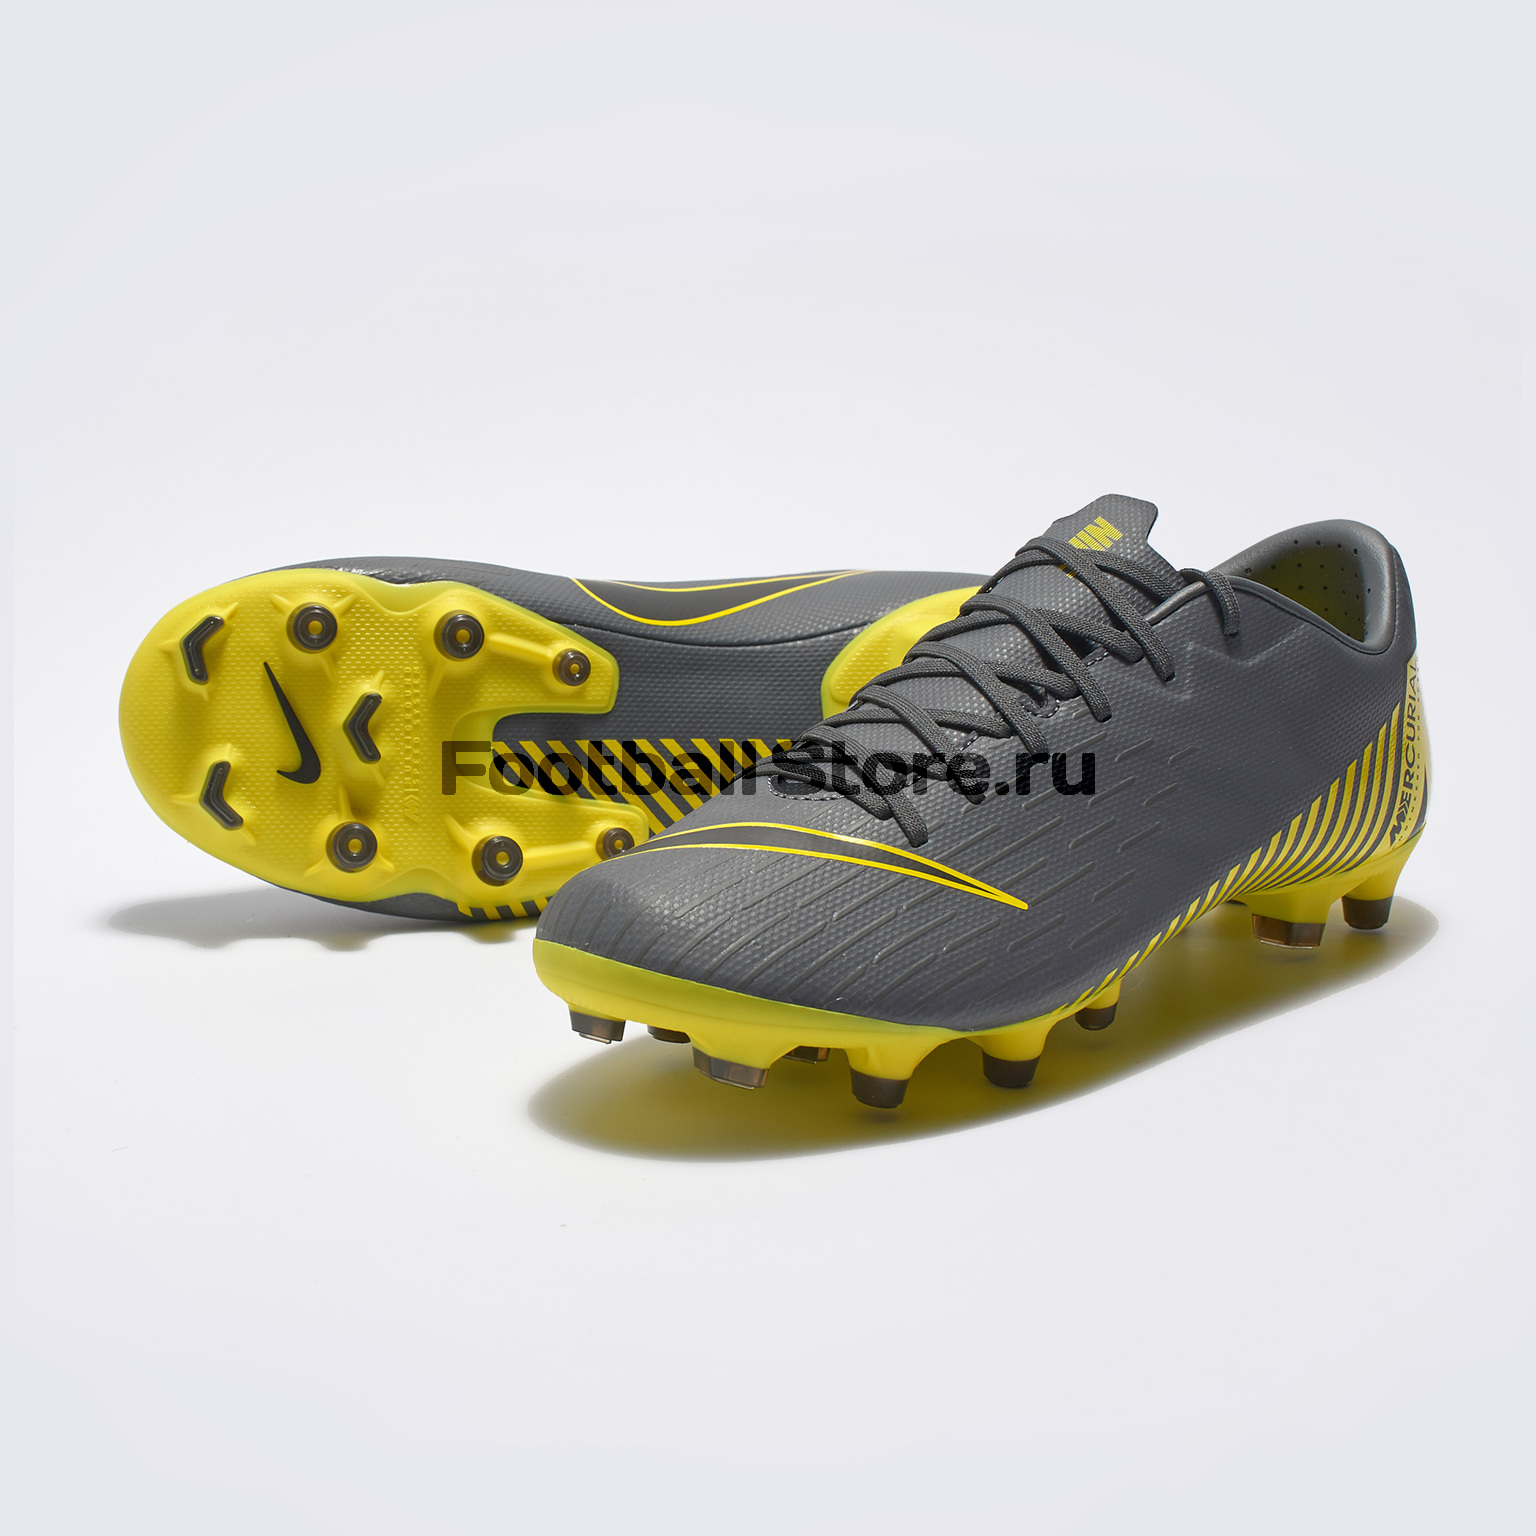 Бутсы Nike Vapor 12 Academy FG/MG AH7375-070 бутсы для мальчика nike jrbravata ii fg цвет желтый черный 844442 070 размер 13c 30